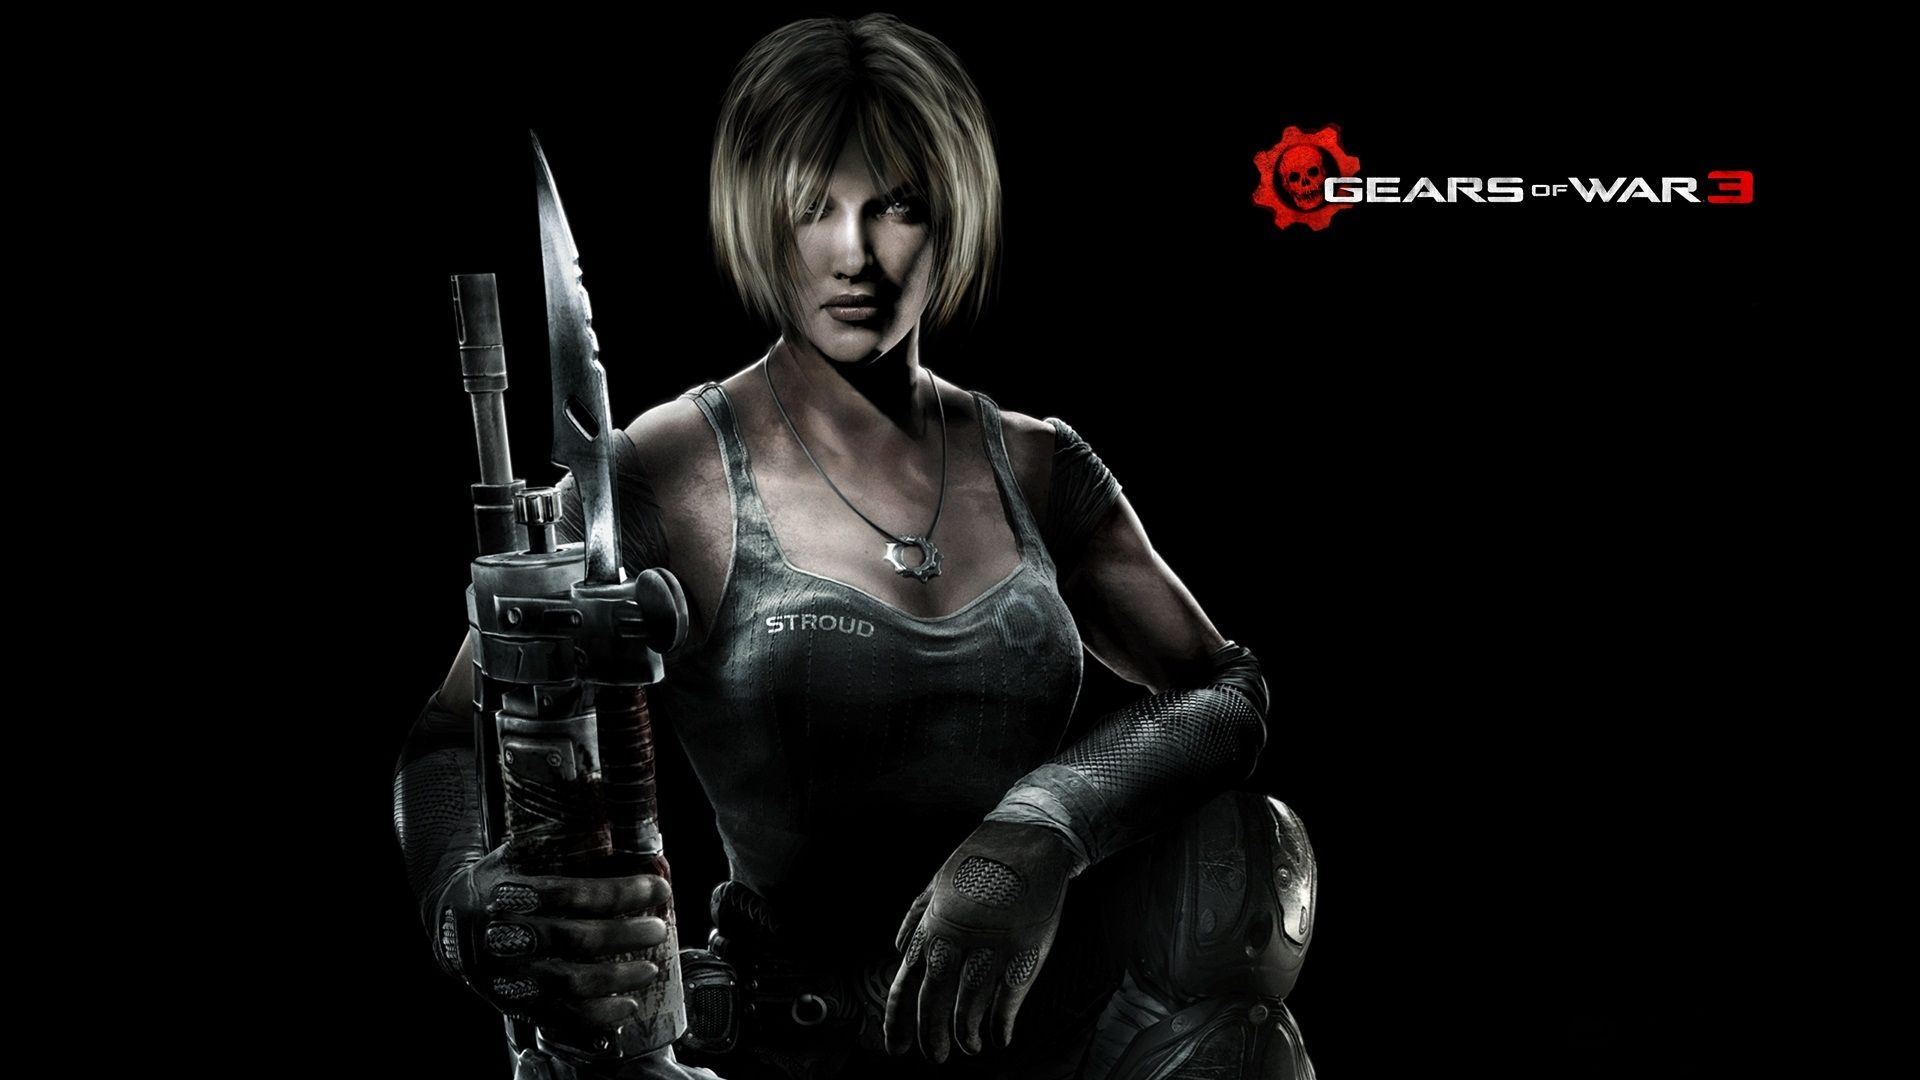 Fabulous Gears Of War 3 Girl Gun Look Blonde Anya Stroud